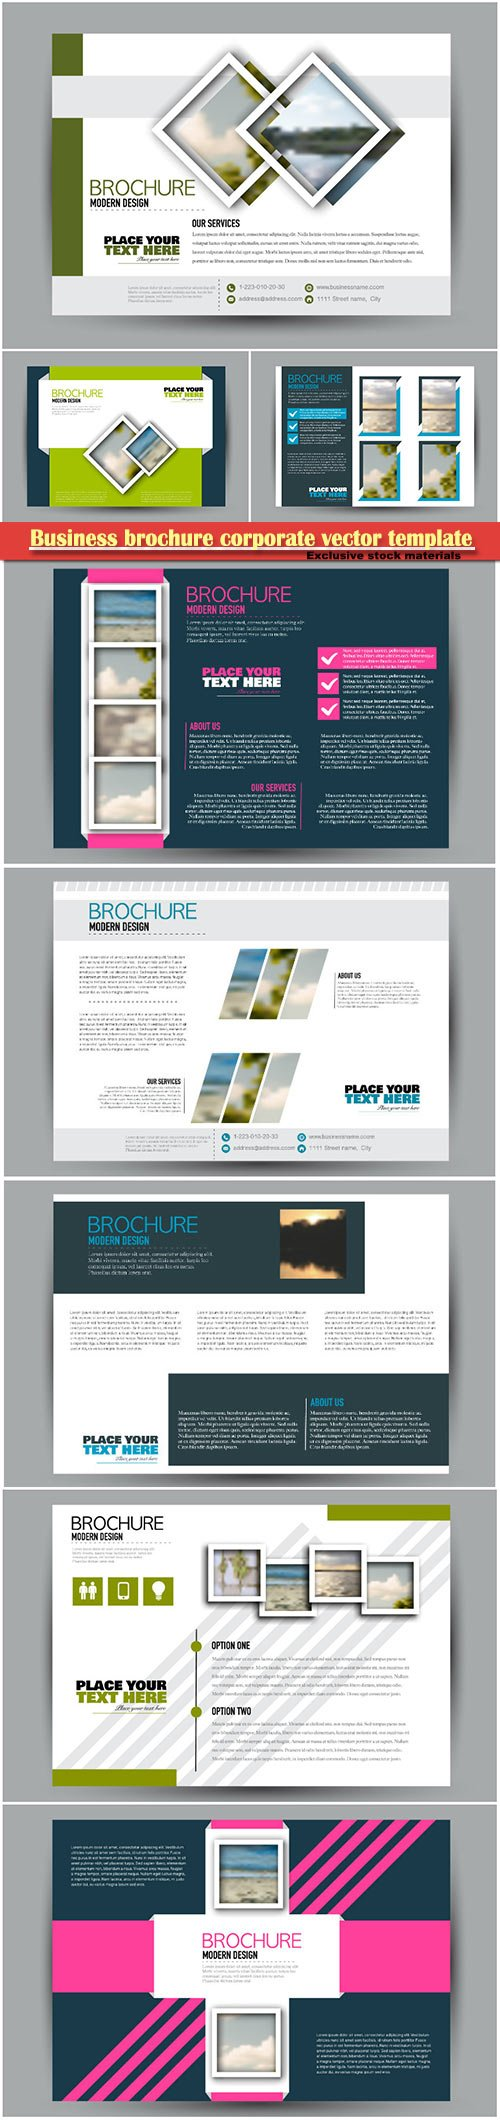 Business brochure corporate vector template, magazine flyer mockup # 15